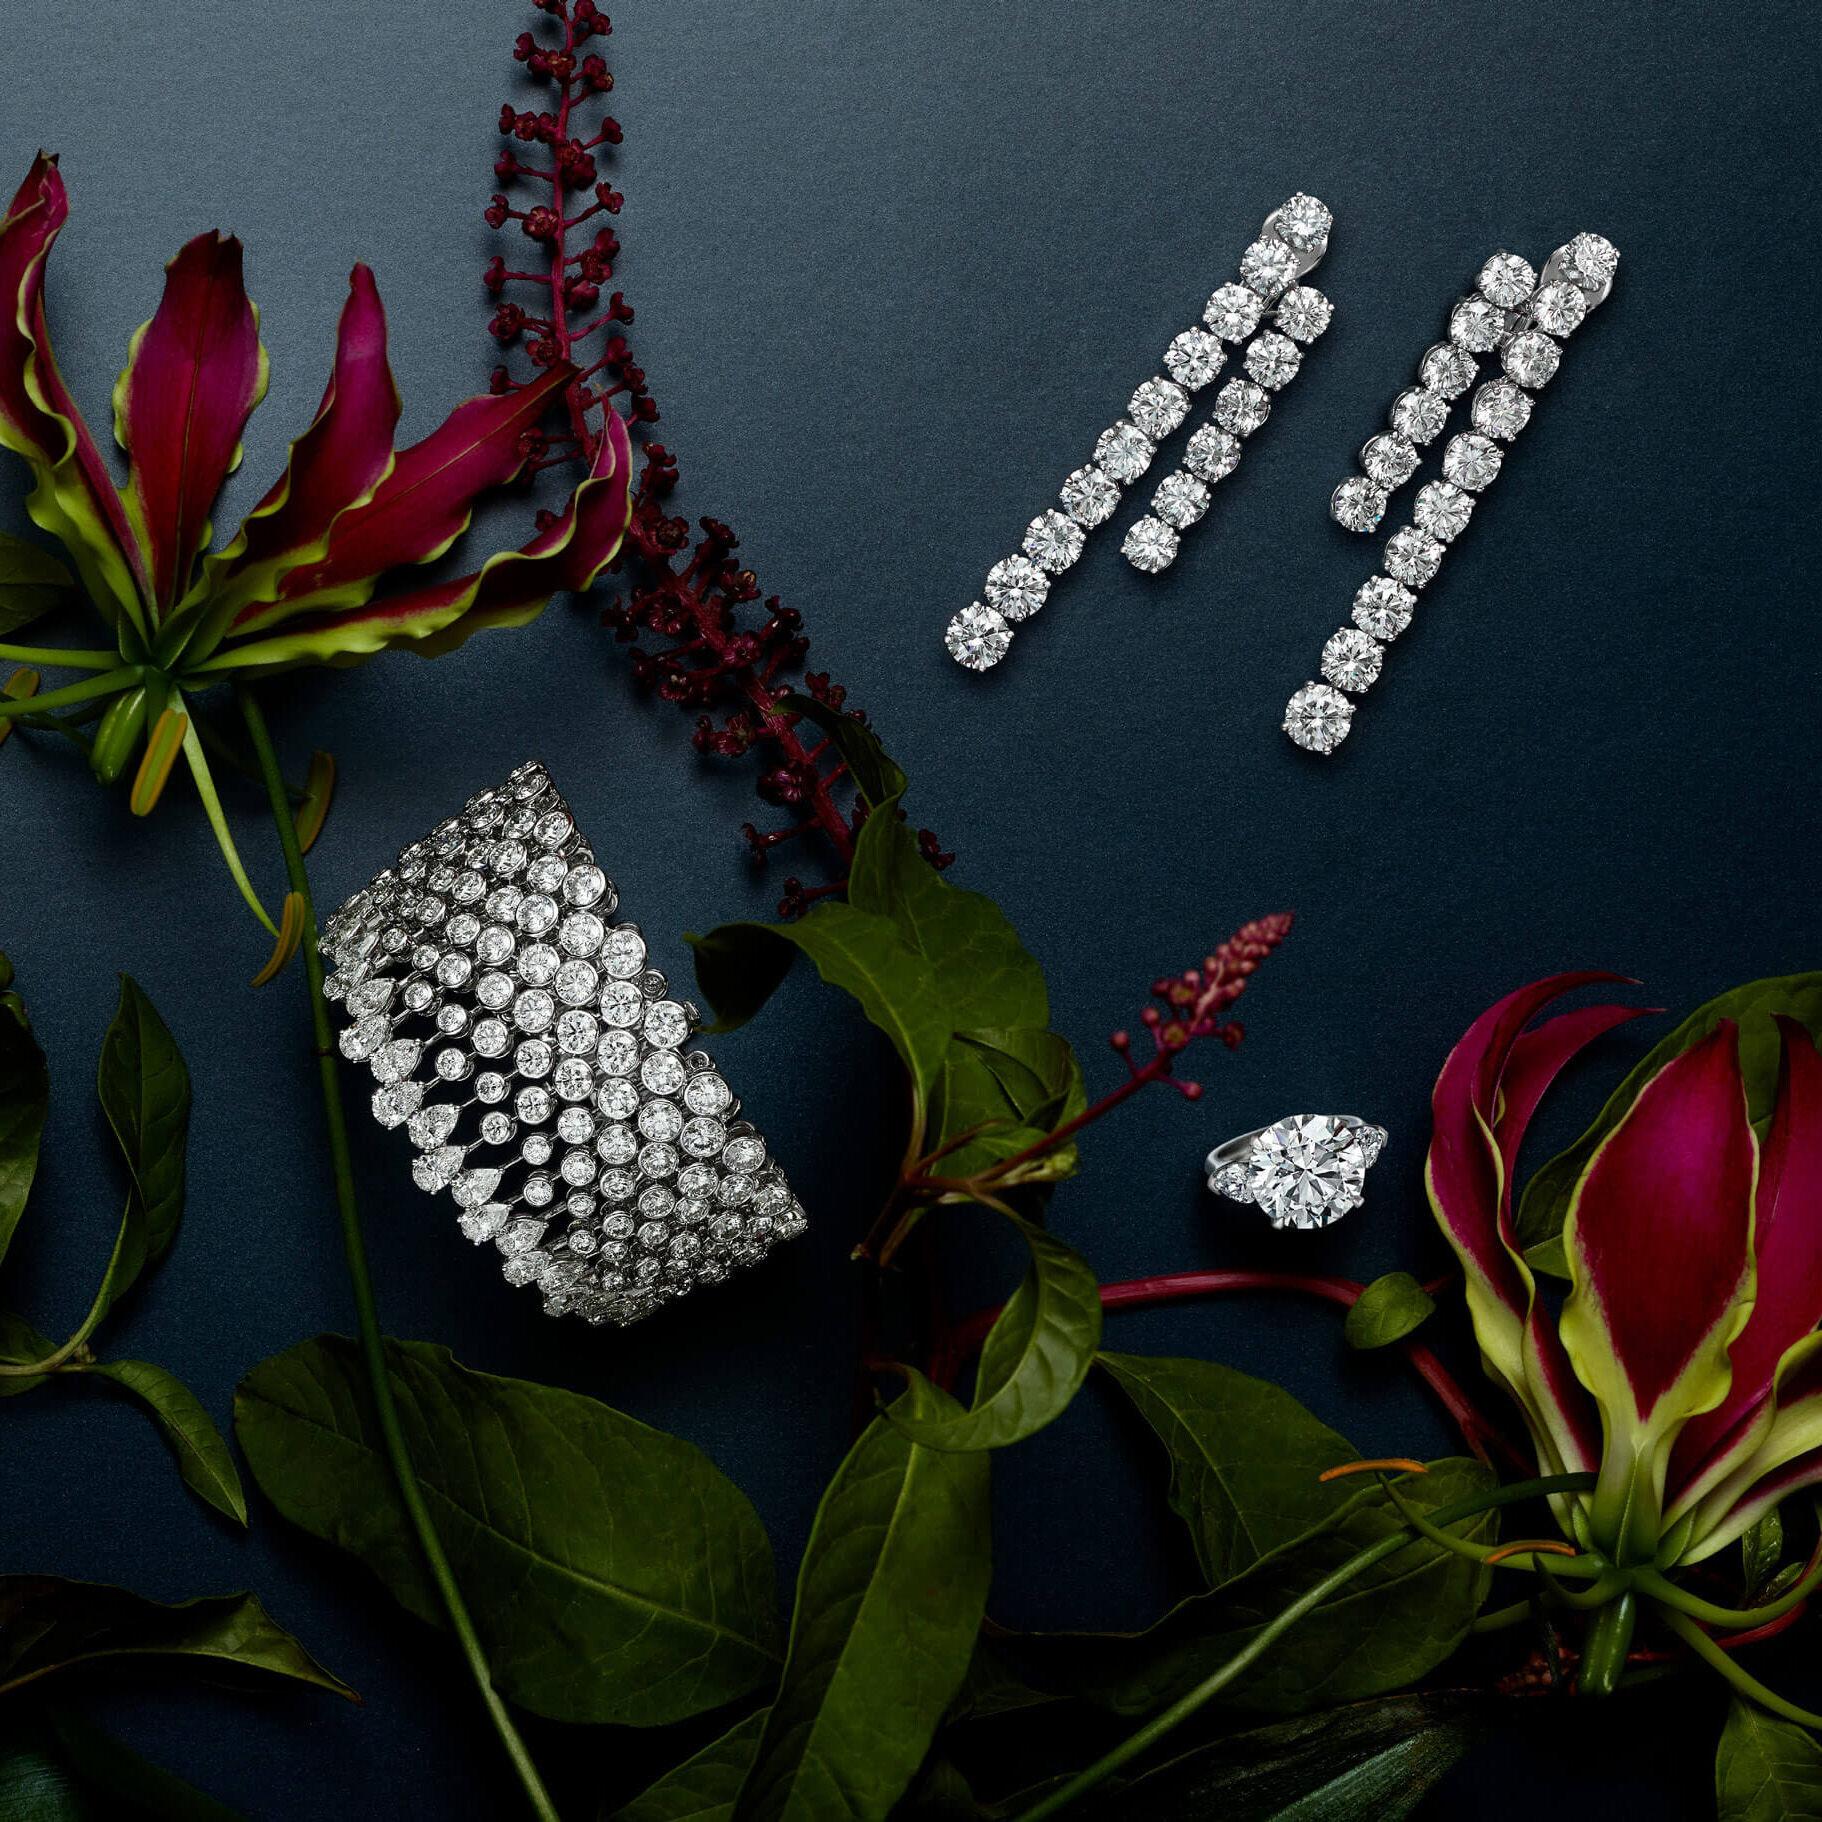 Graff diamond High jewellery with flowers decorations